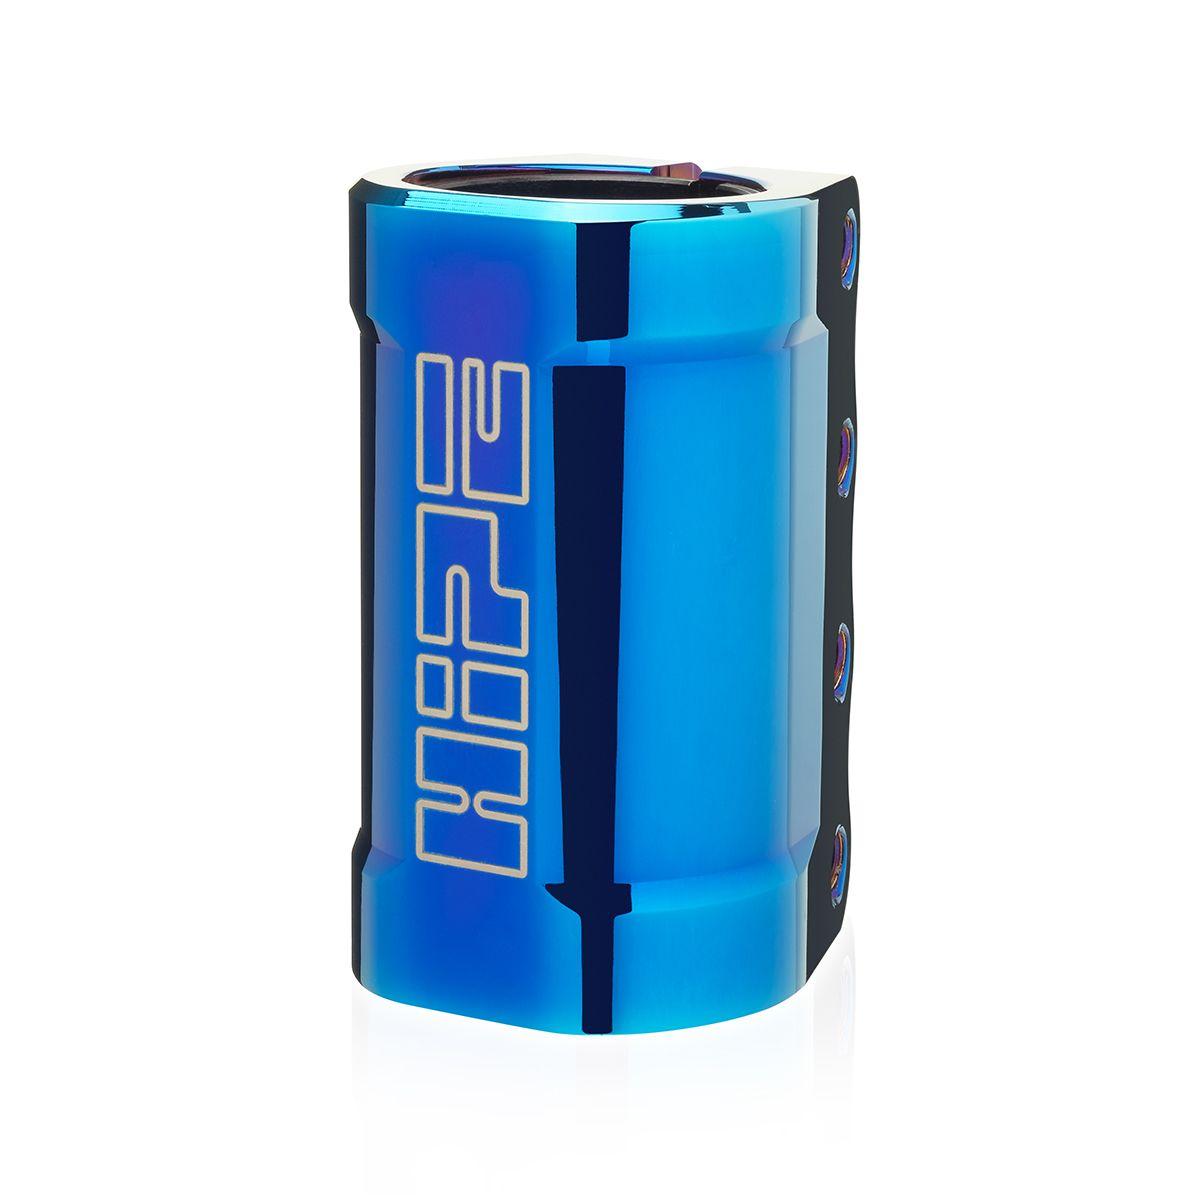 Хомут HIPE H-70 SCS neo-blue